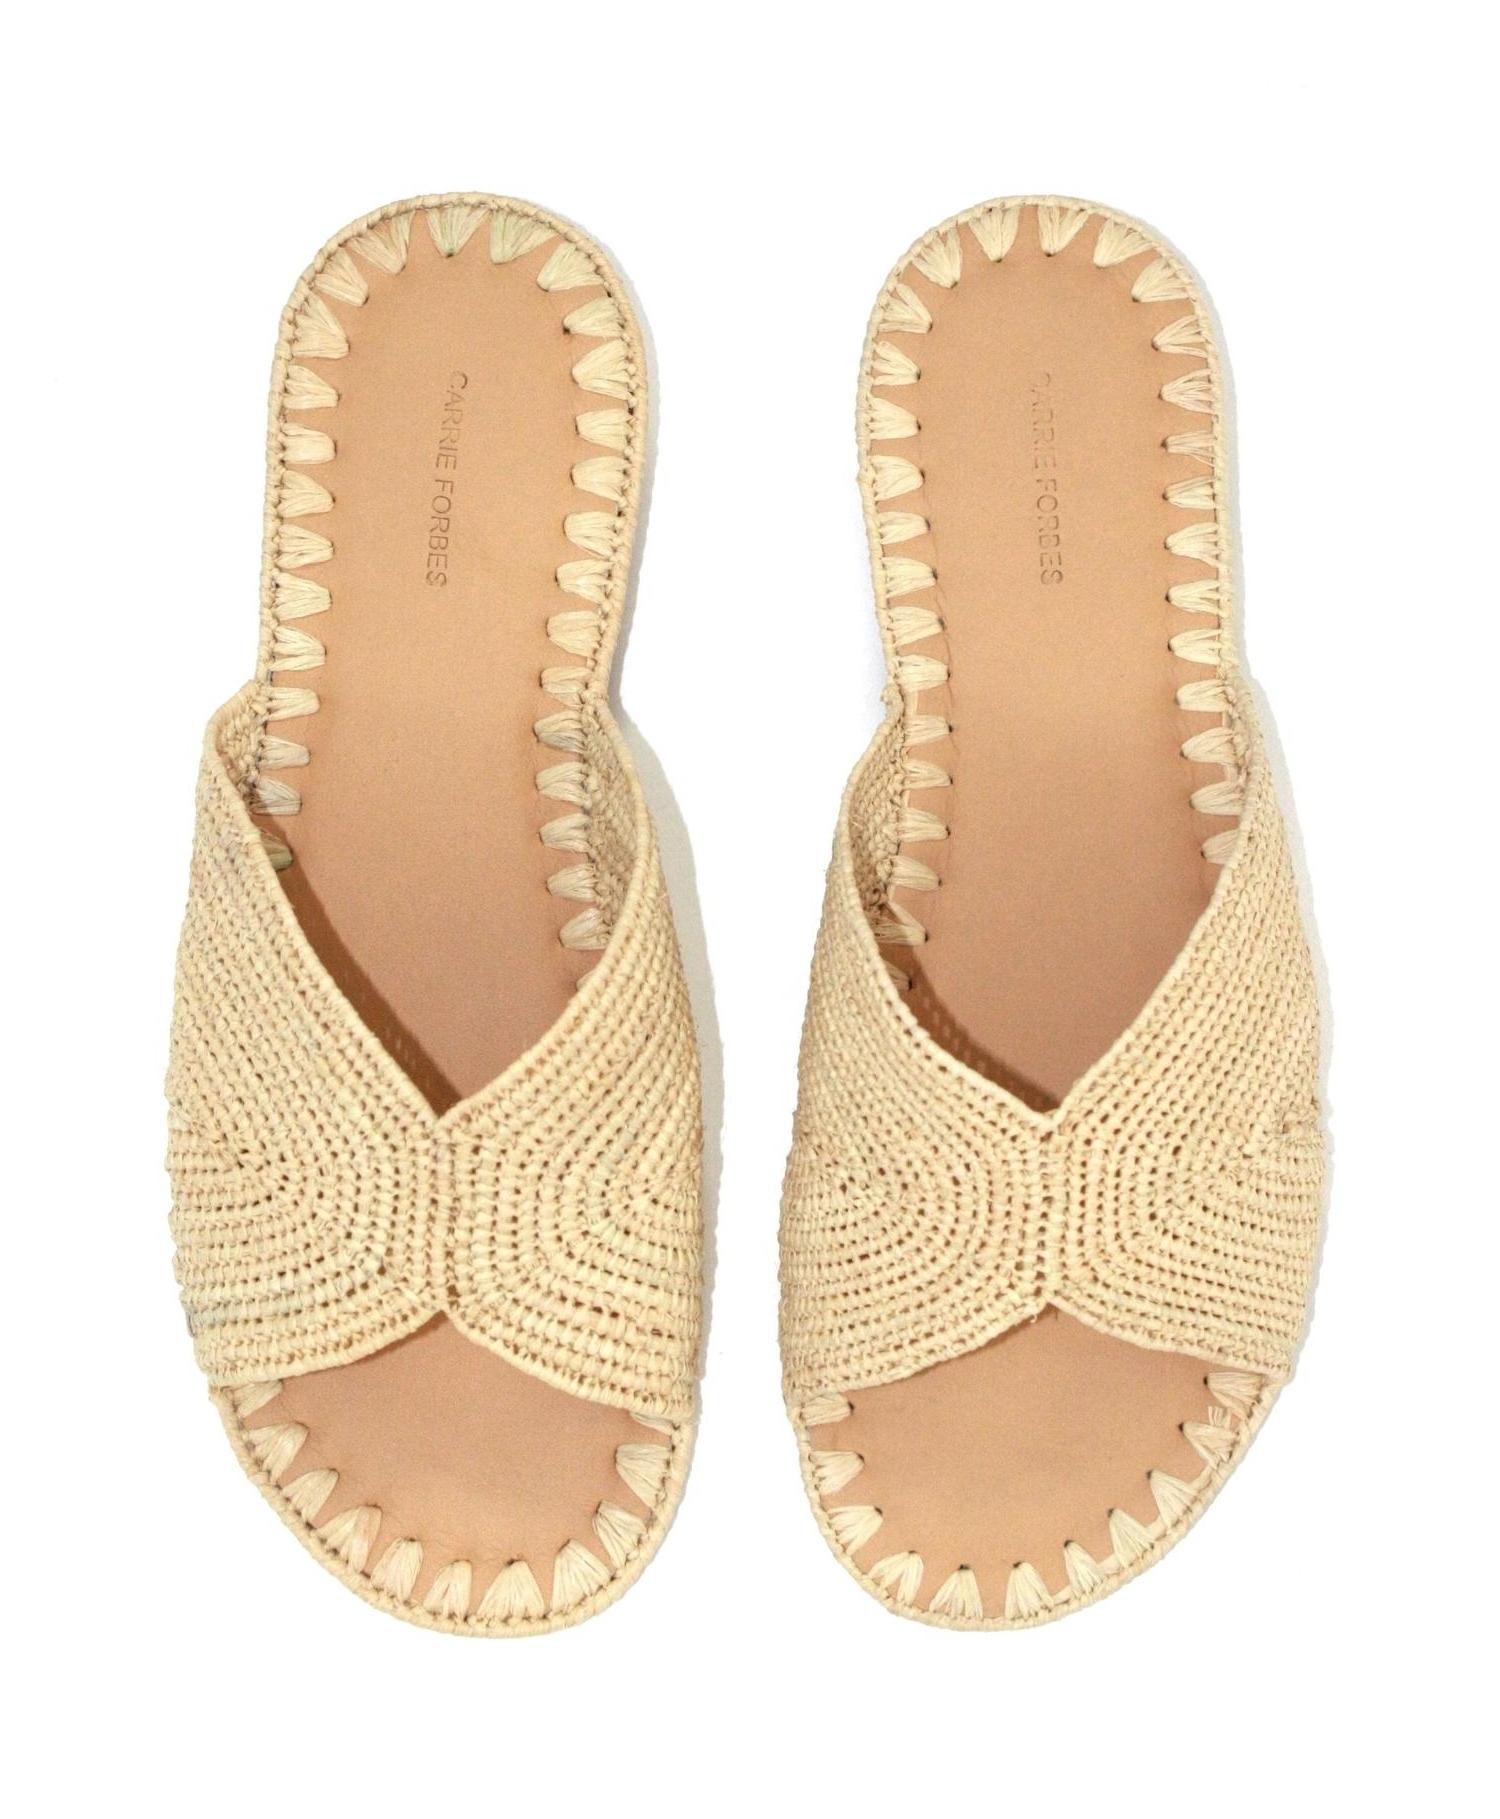 Salon Slide Sandal<br><strong>Carrie Forbes</strong>